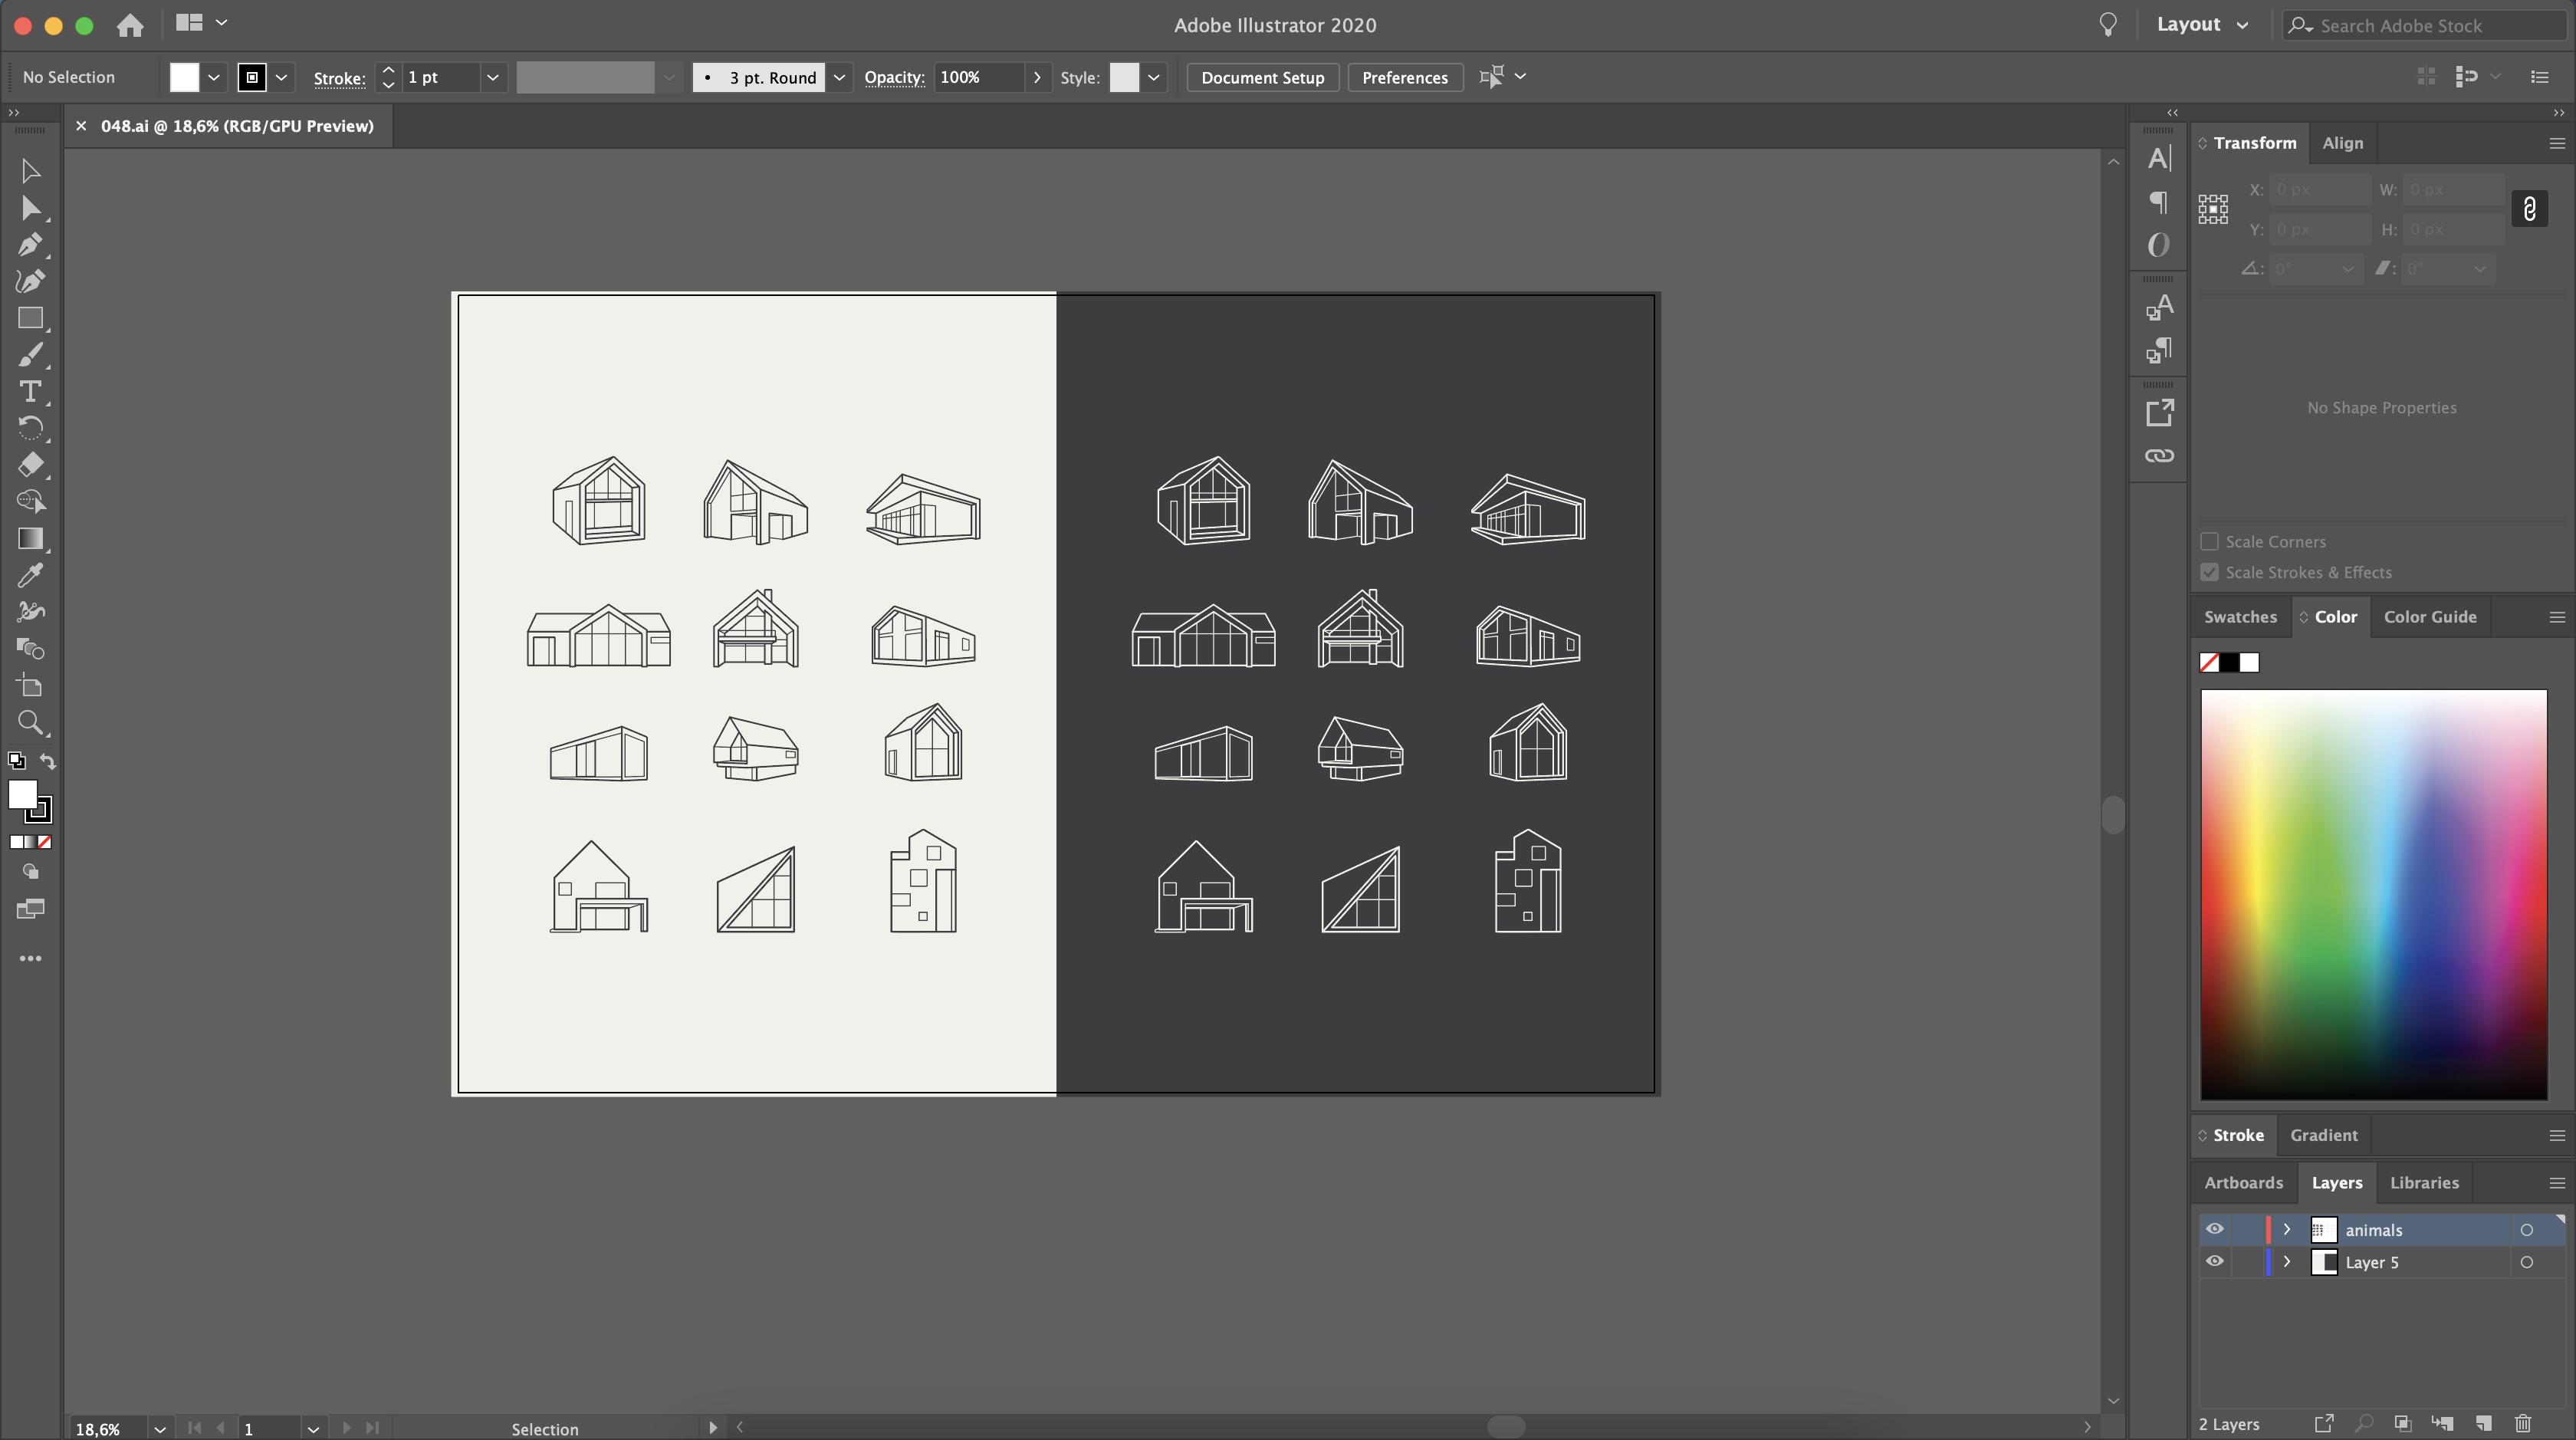 illustrator-interface.png